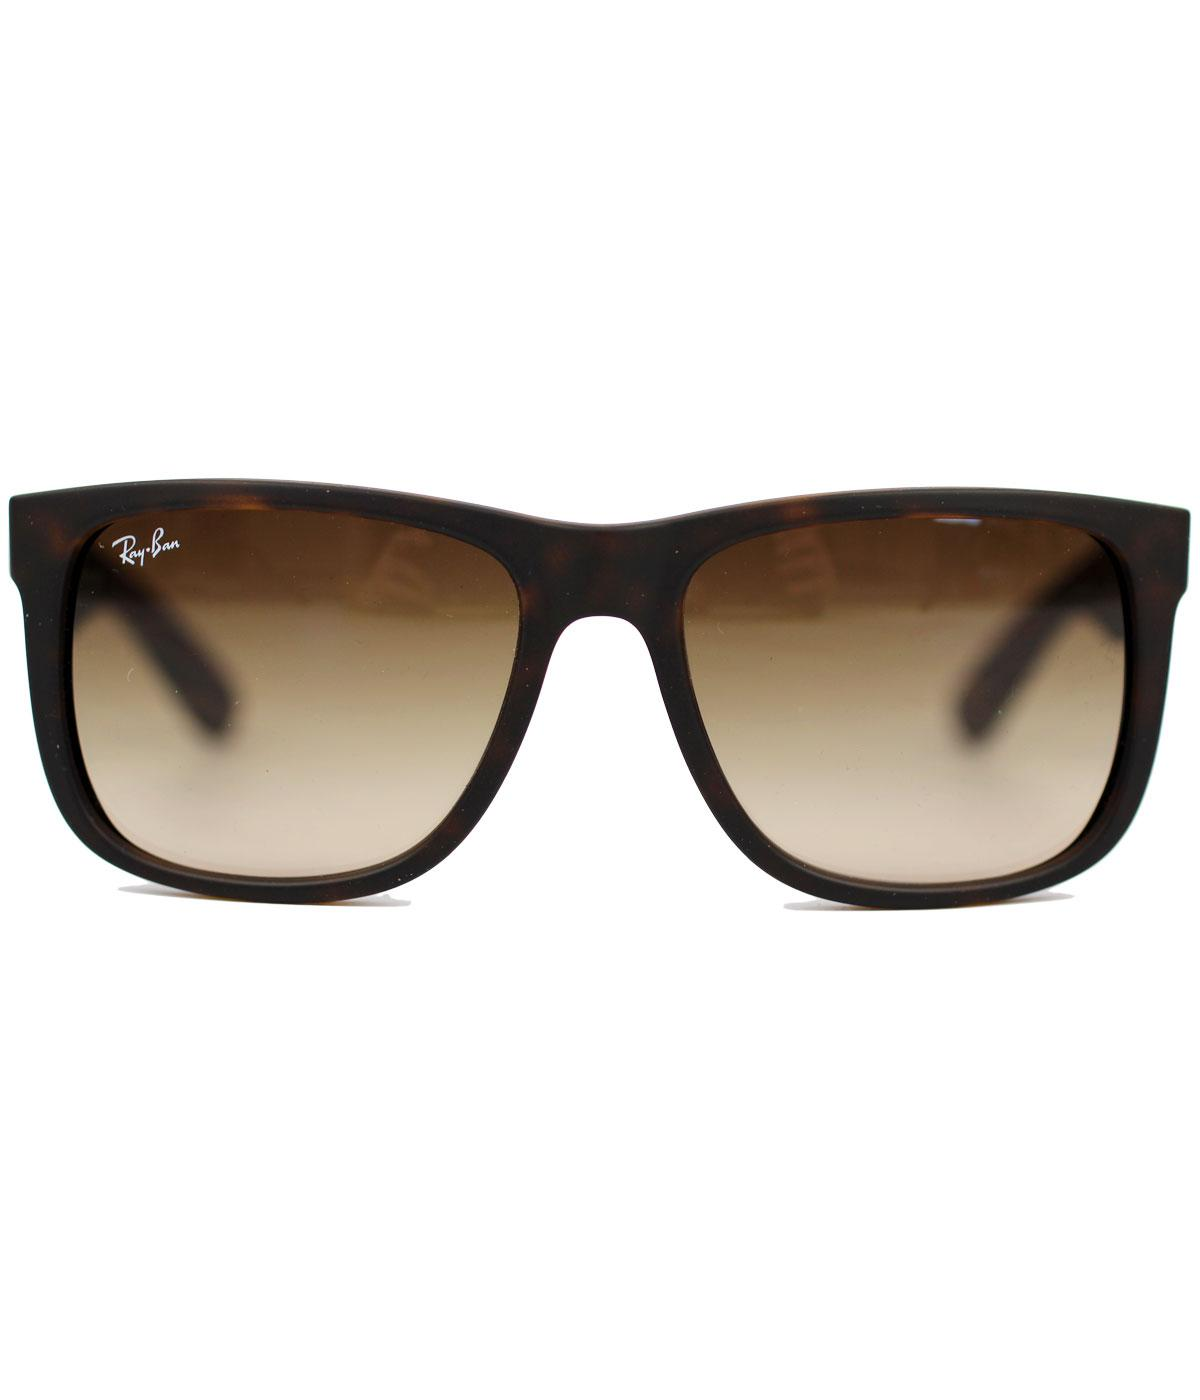 Ray-Ban Justin Retro Havana Wayfarer Sunglasses